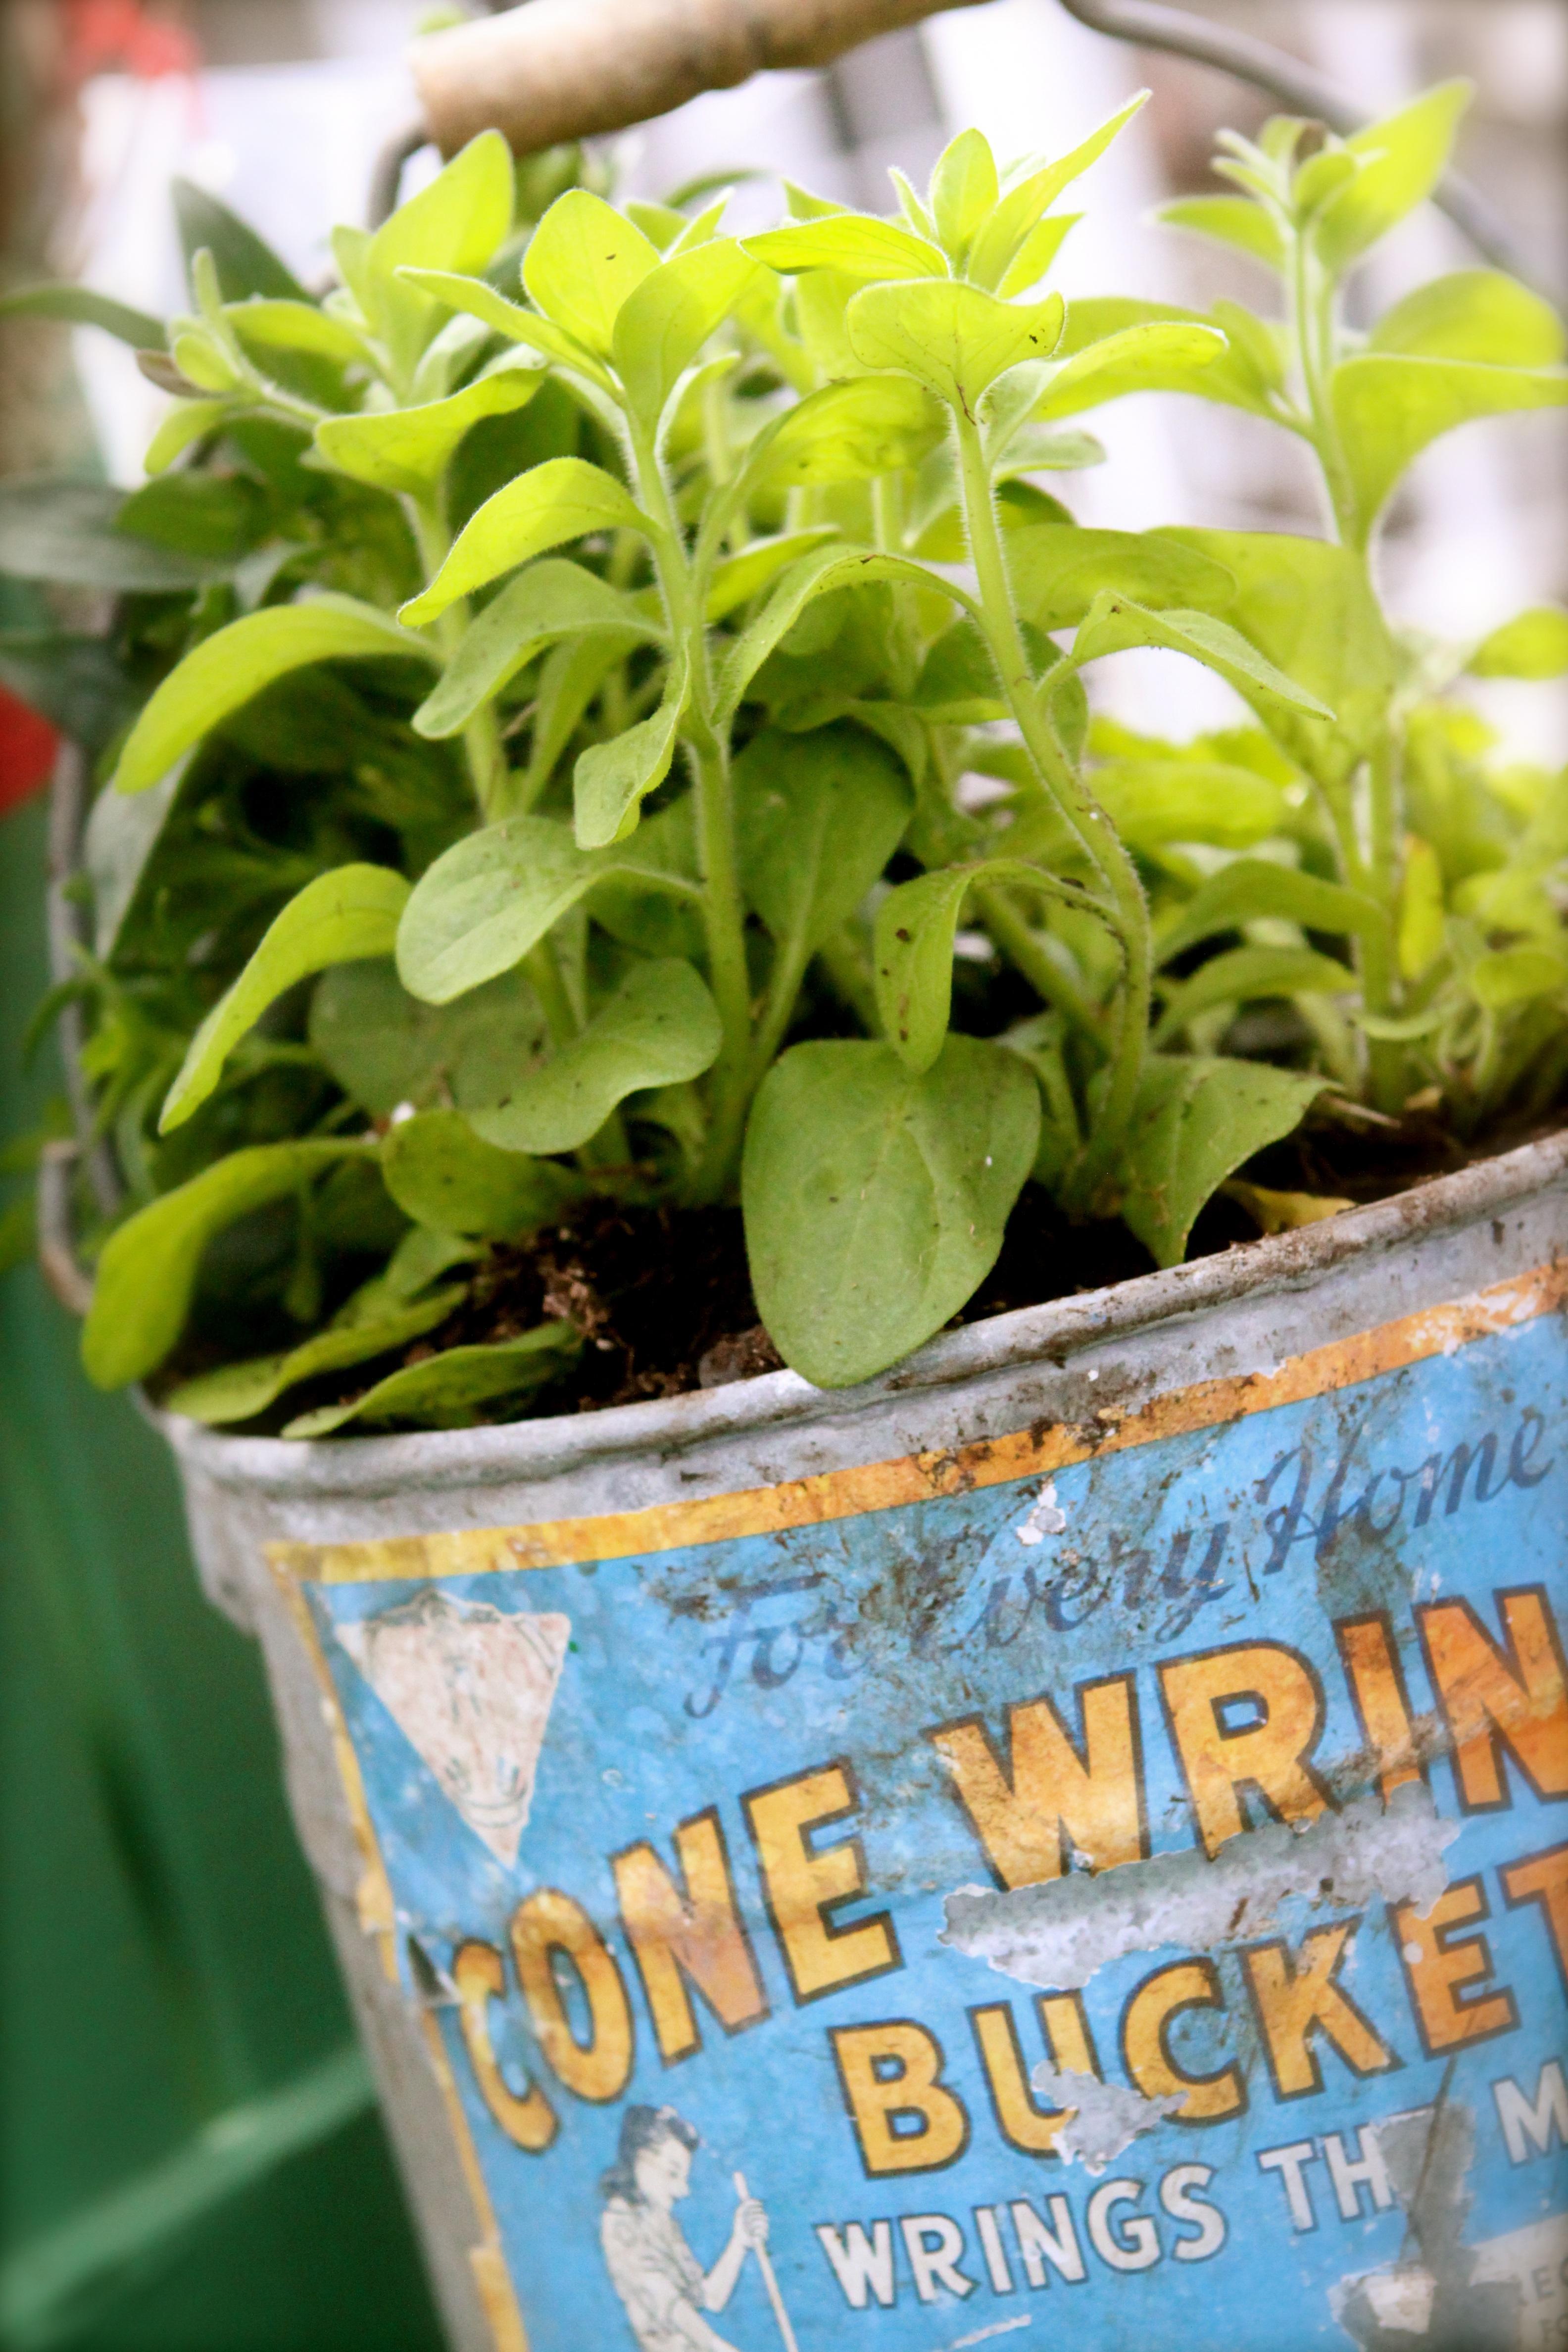 free images : nature, creative, plant, wood, vintage, flower